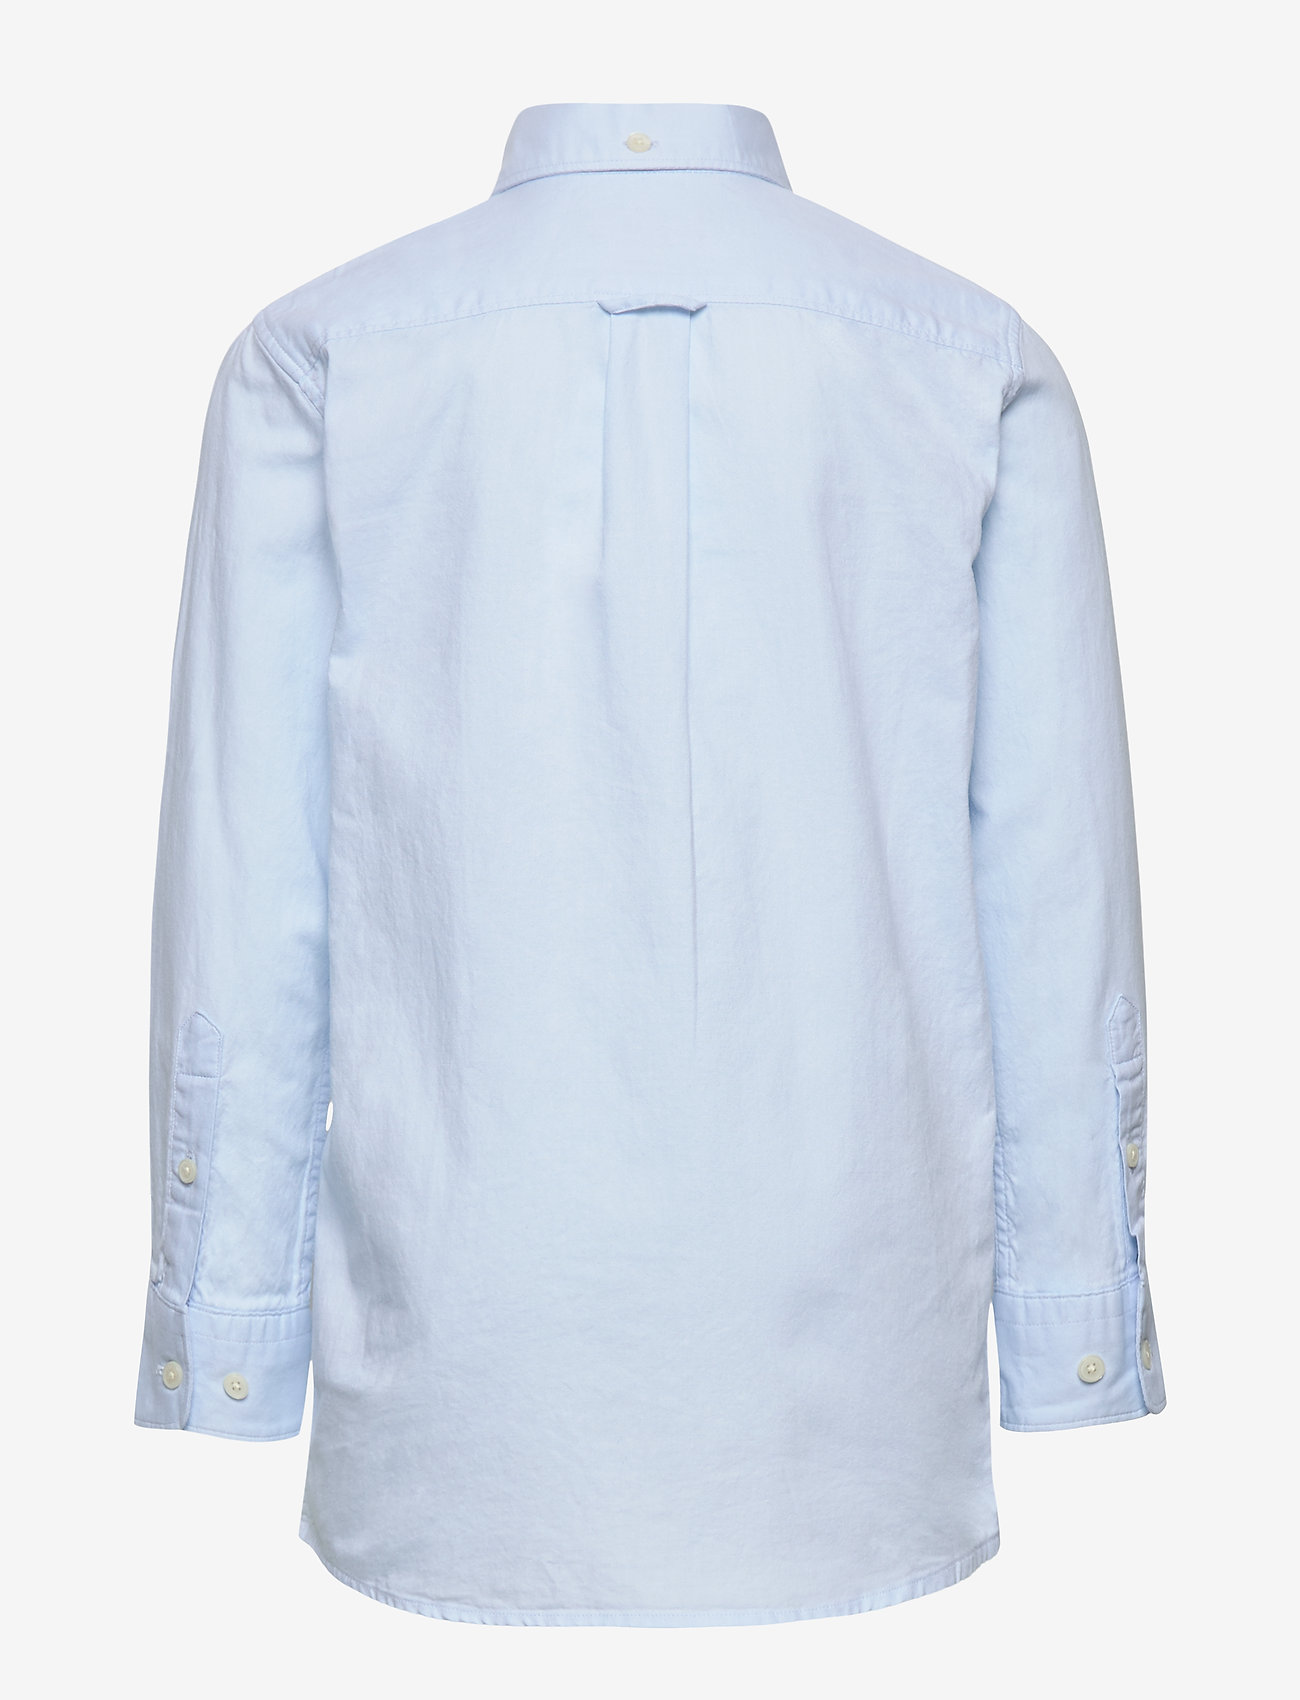 GANT - ARCHIVE OXFORD B.D SHIRT - shirts - capri blue - 1